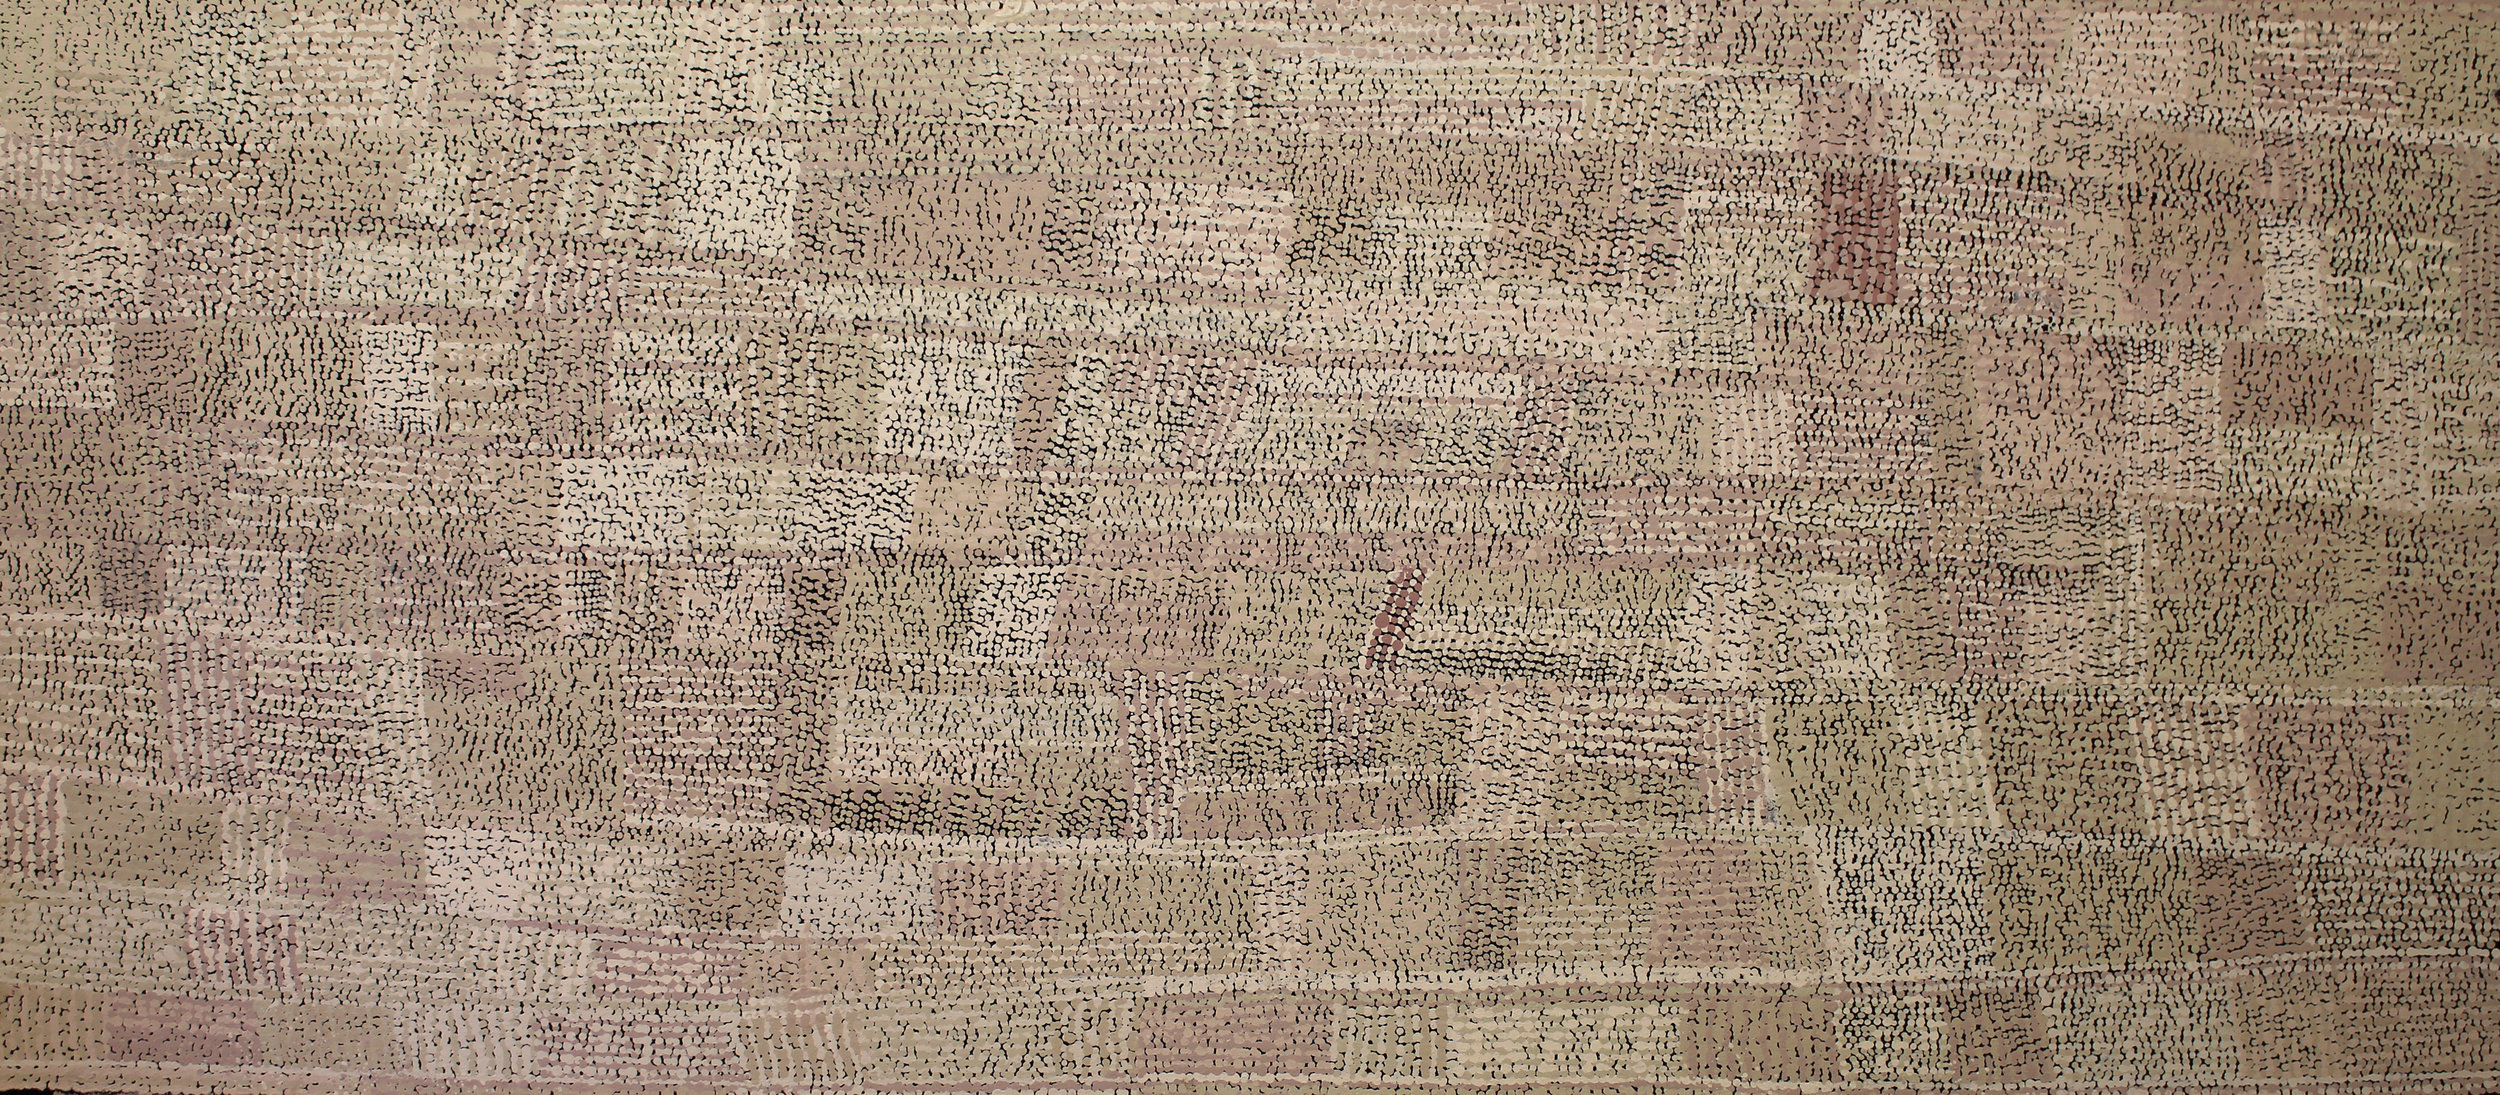 YURIPYA LIONEL  Anumara, 2017  670 x 1500mm Acrylic on Linen Catalog #335-17   EMAIL INQUIRY